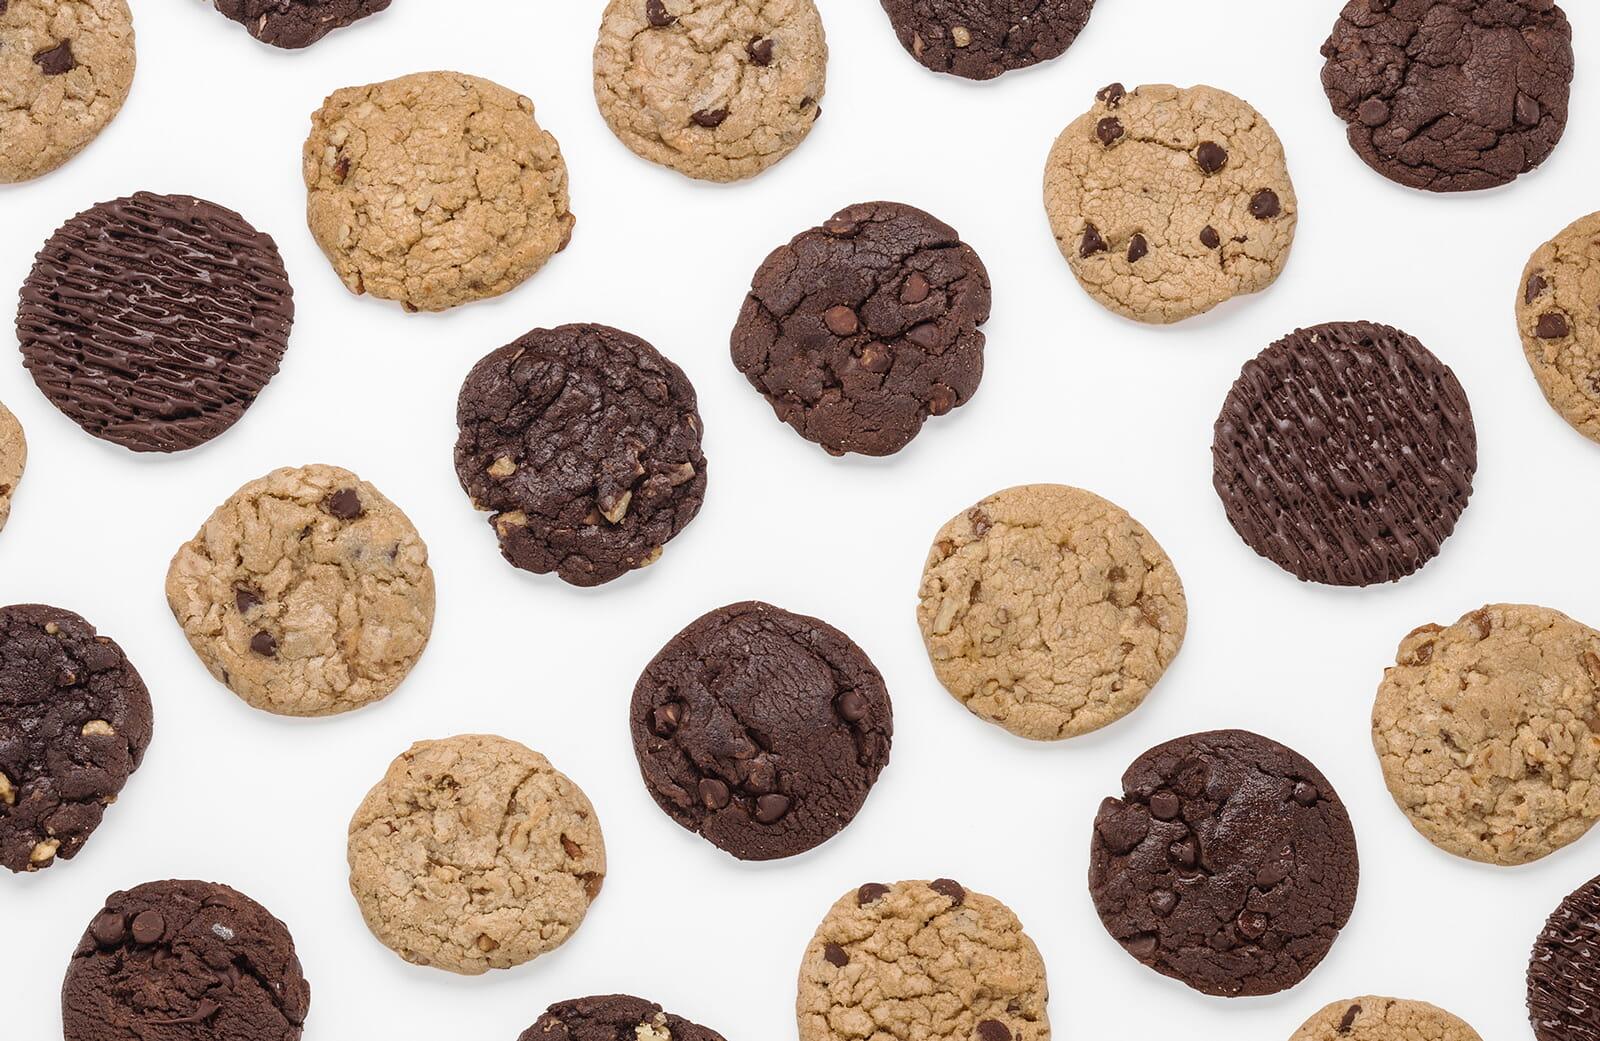 Fairytale Cookies